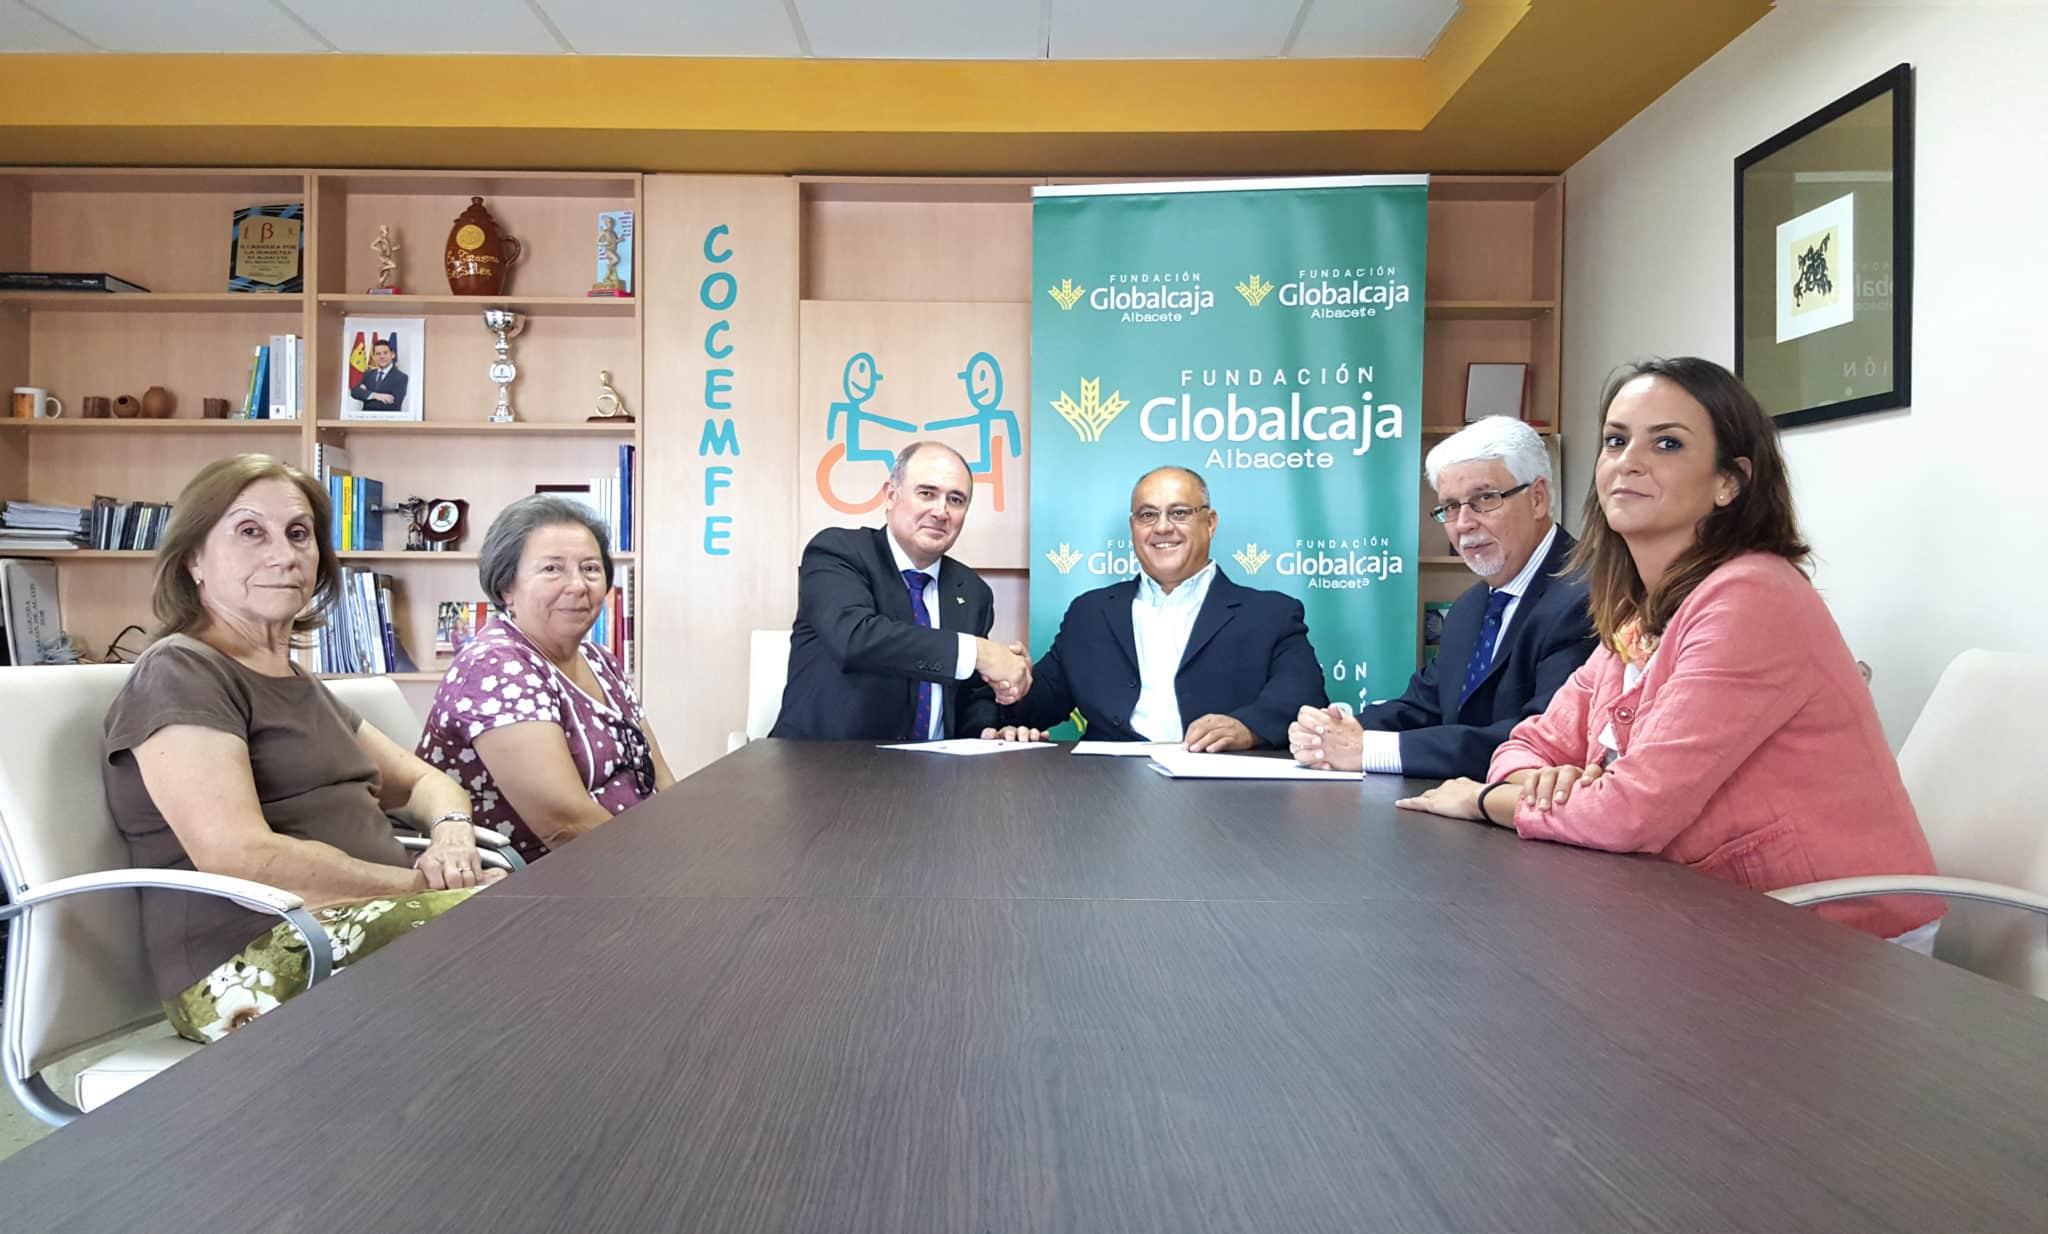 LA FUNDACION GLOBALCAJA ALBACETE RENUEVA SU APOYO CON COCEMFE